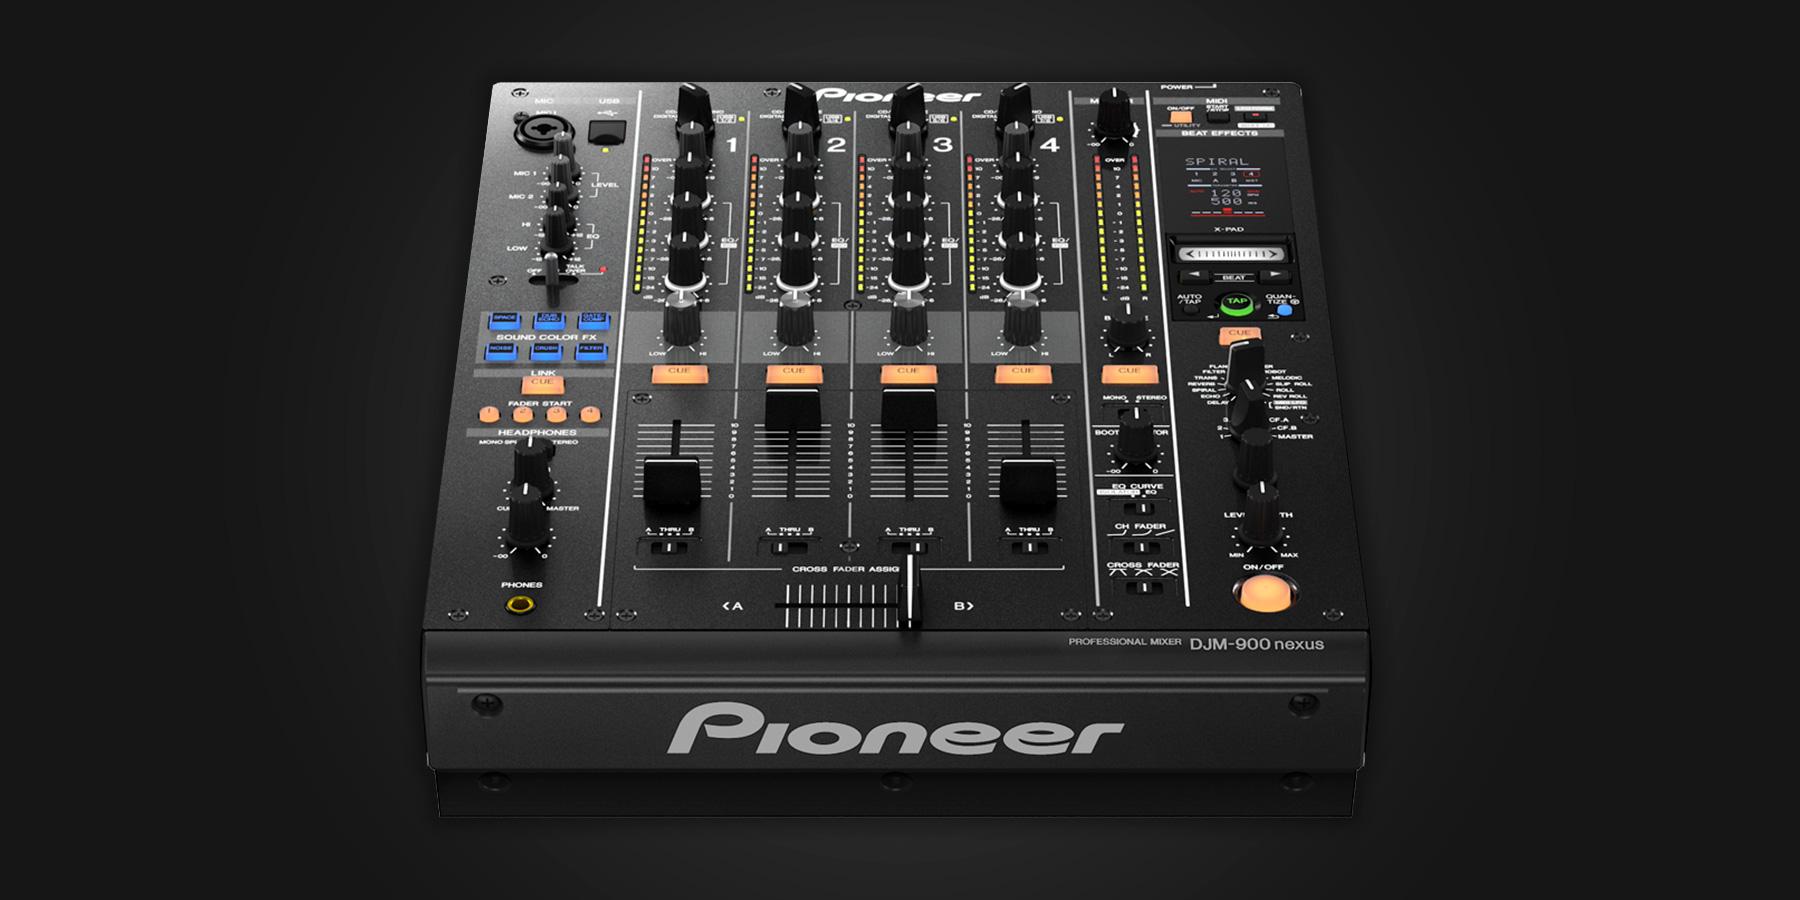 Pioneer Dj Djm 900nxs Serato Dj Dj Hardware Learn More